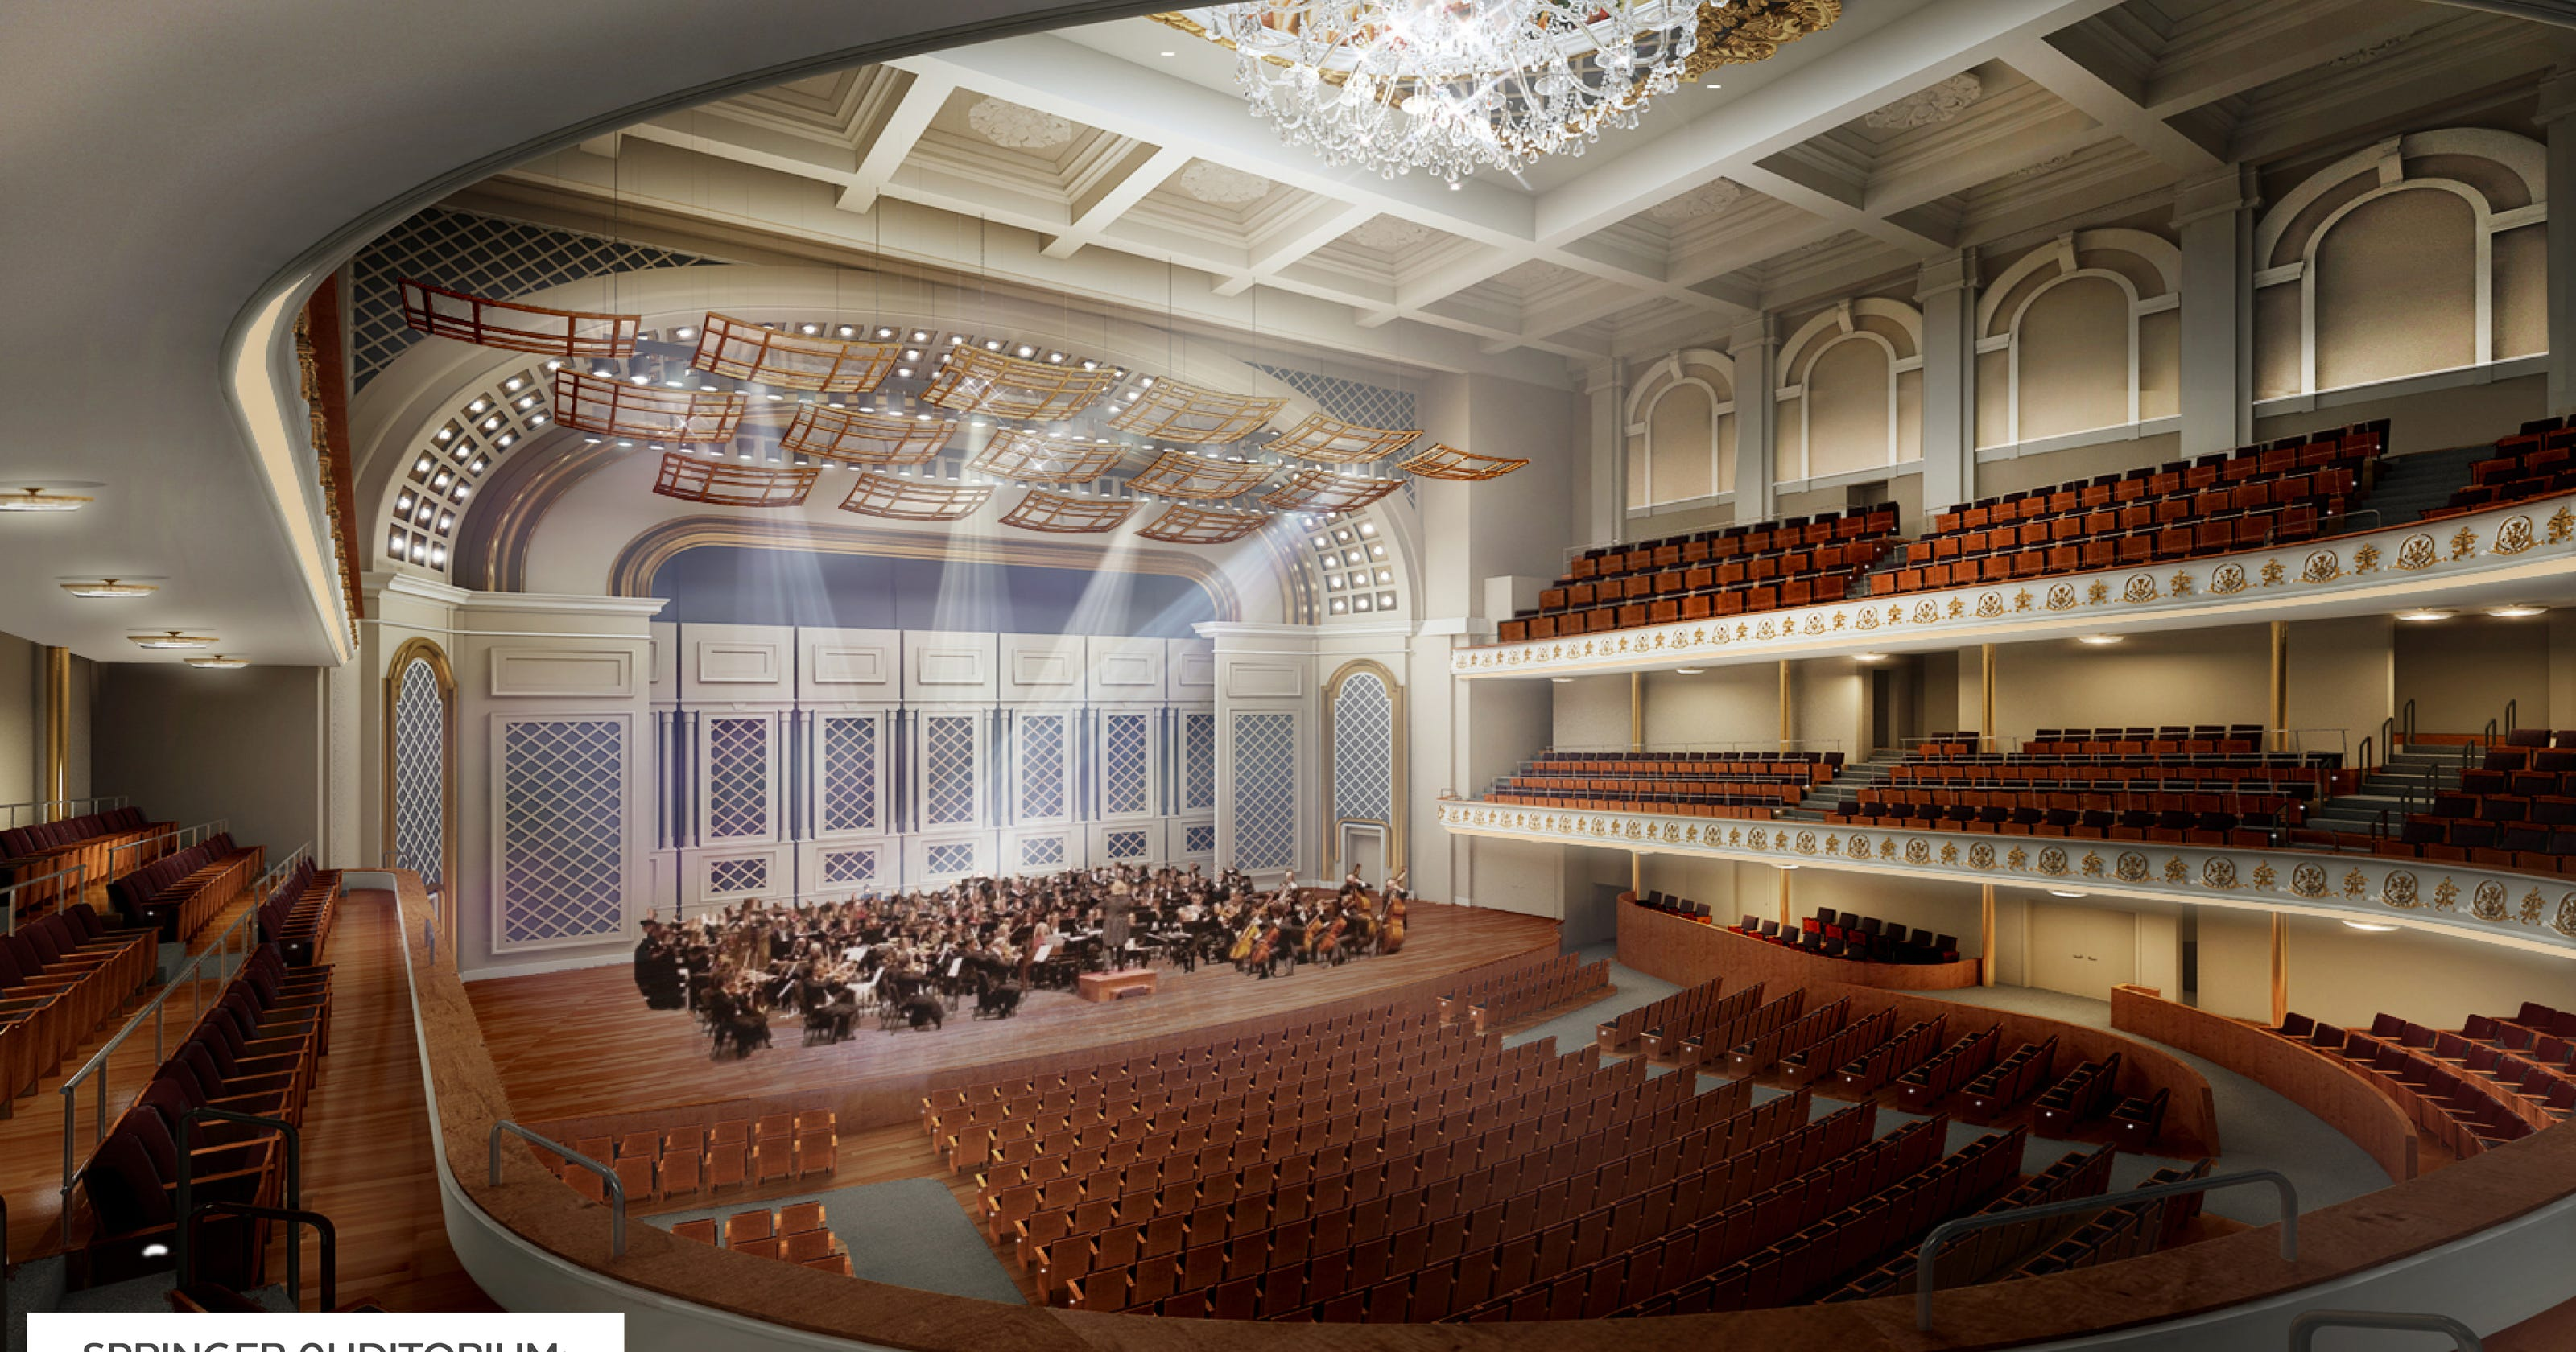 In legendary music hall acoustics matter